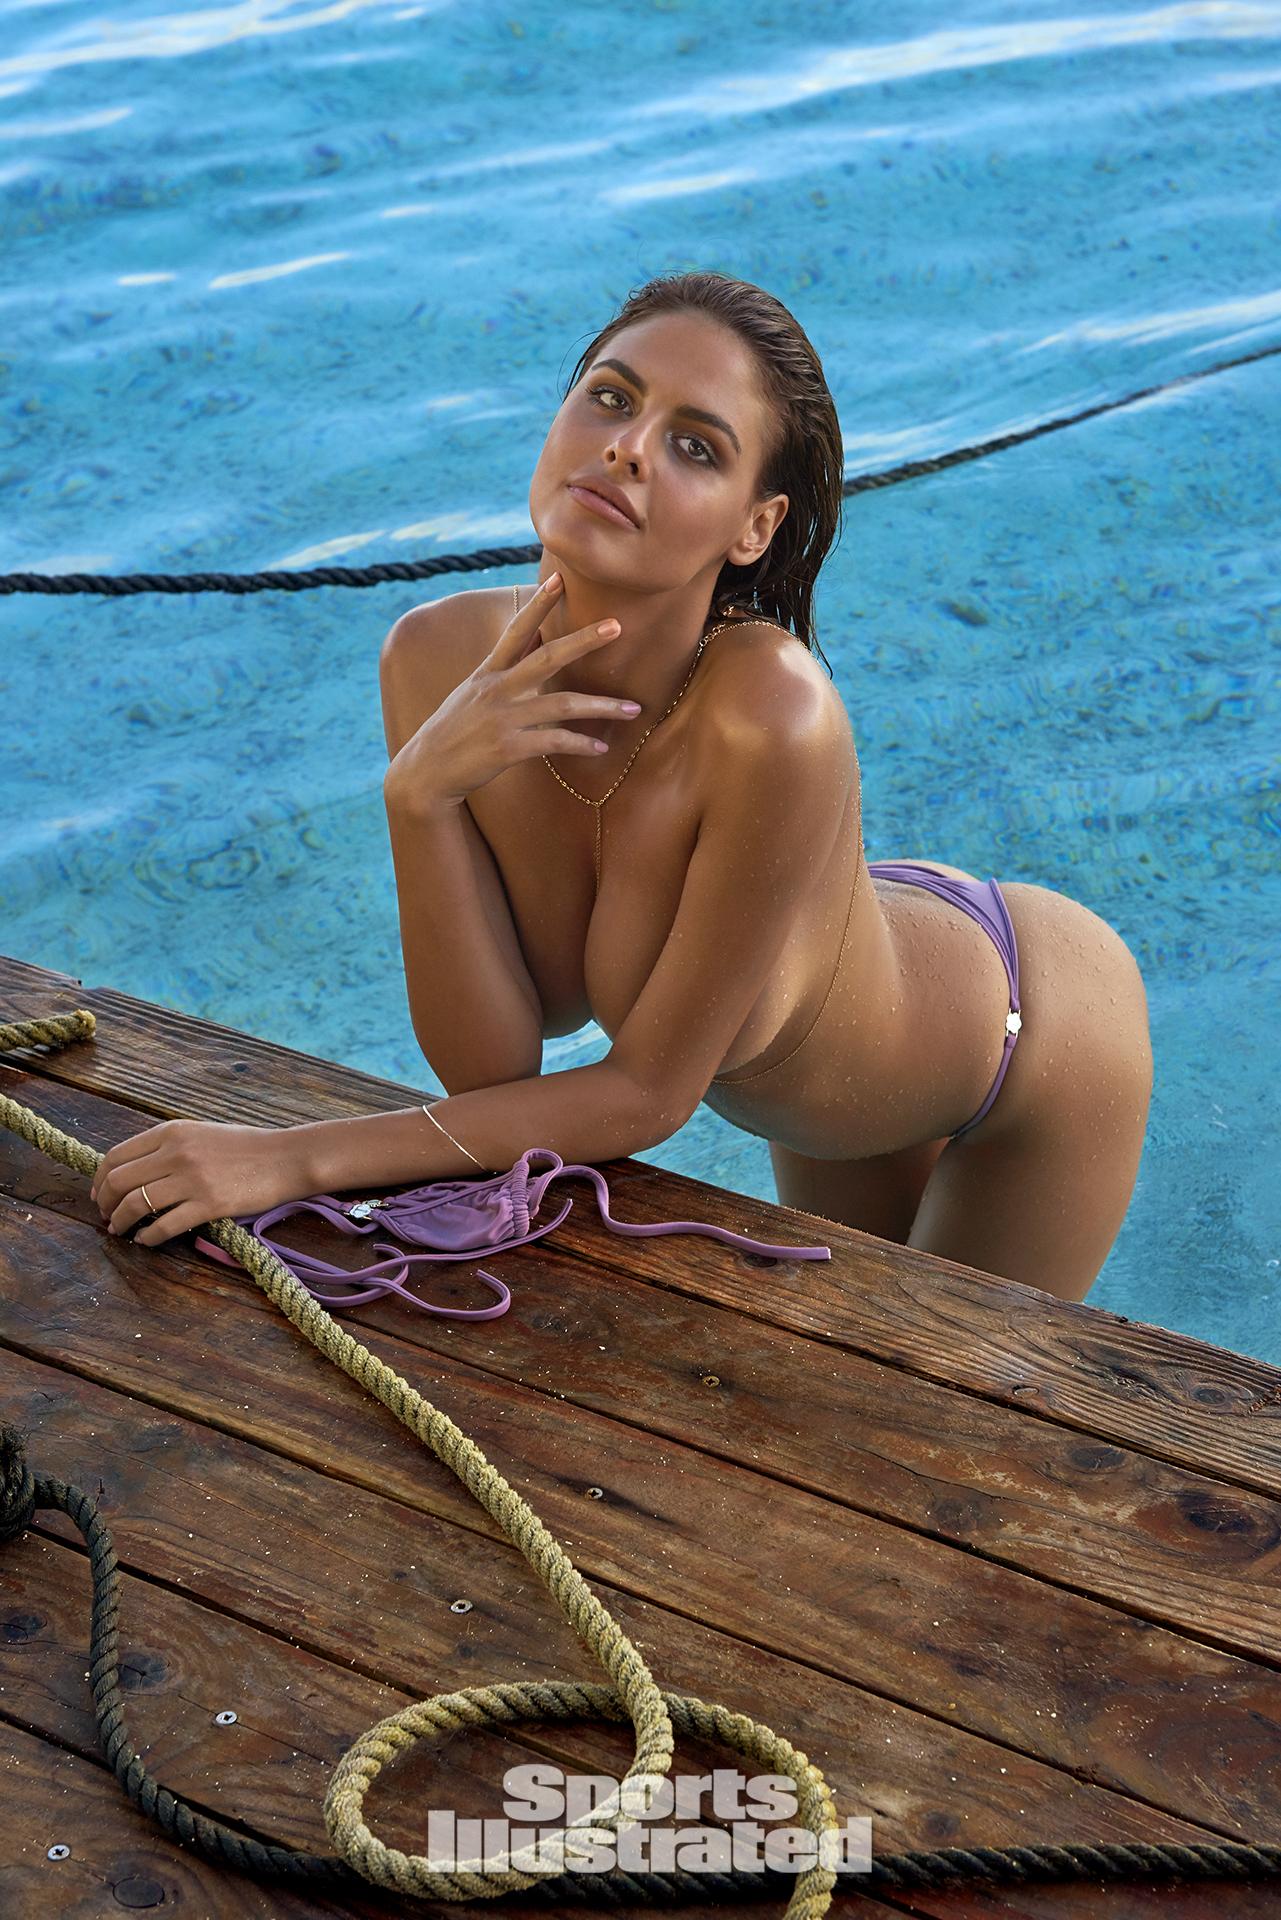 Bo Krsmanovic was photographed by Yu Tsai in The Islands Of Tahiti. Swimsuit by TeenyB Bikini Couture.